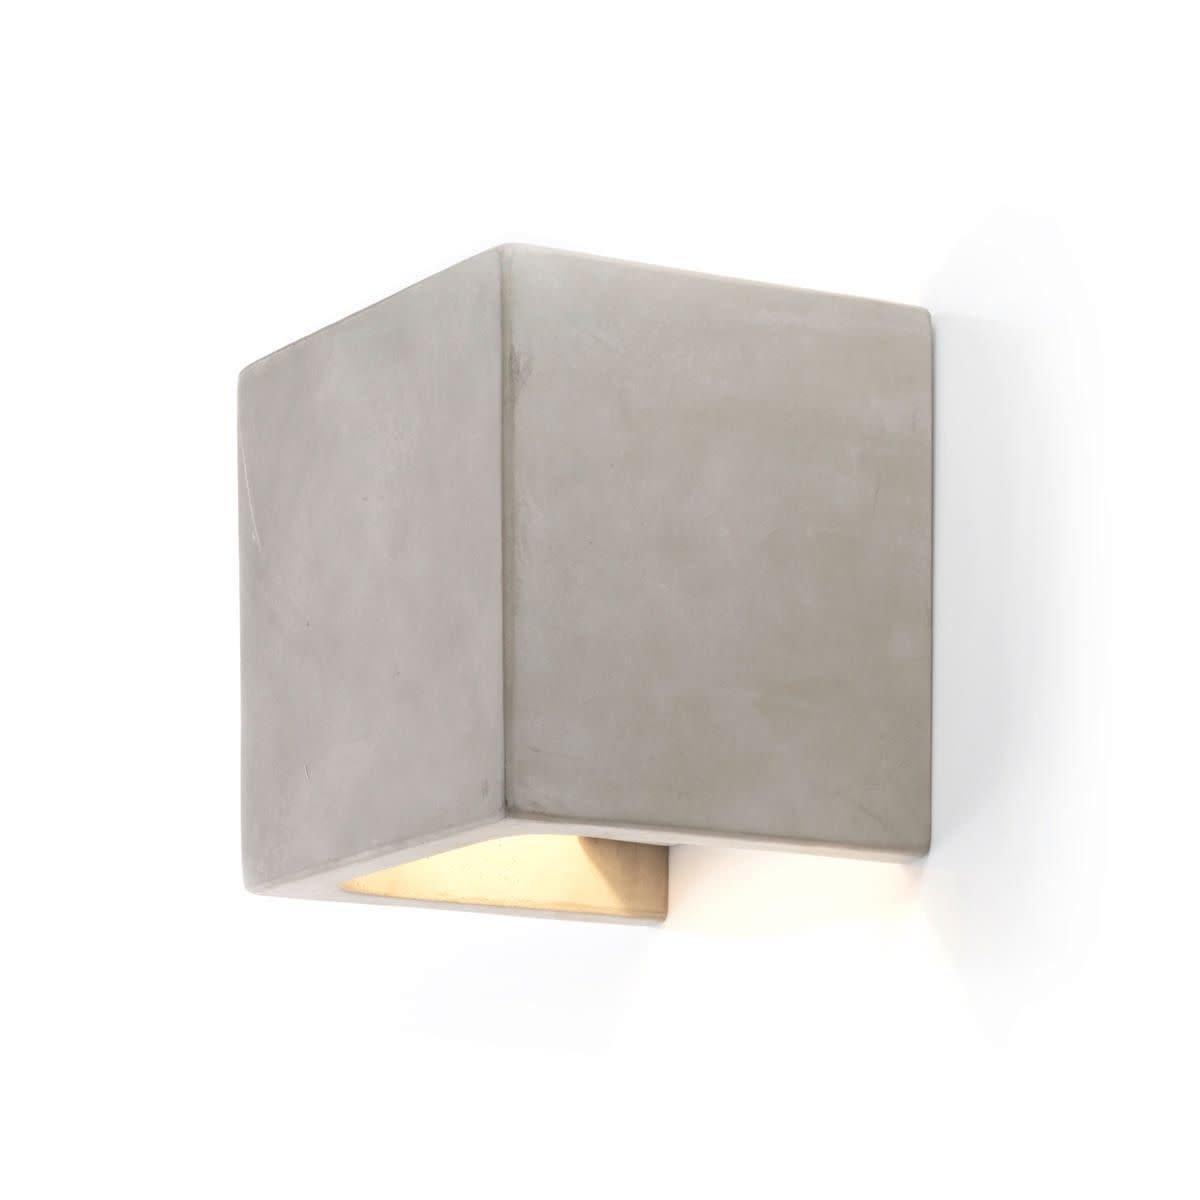 IMPRESSIONEN living Wandleuchte Cube - modern Beton - versteckte Wandhalterung - Beton modern - Metall 0fa917